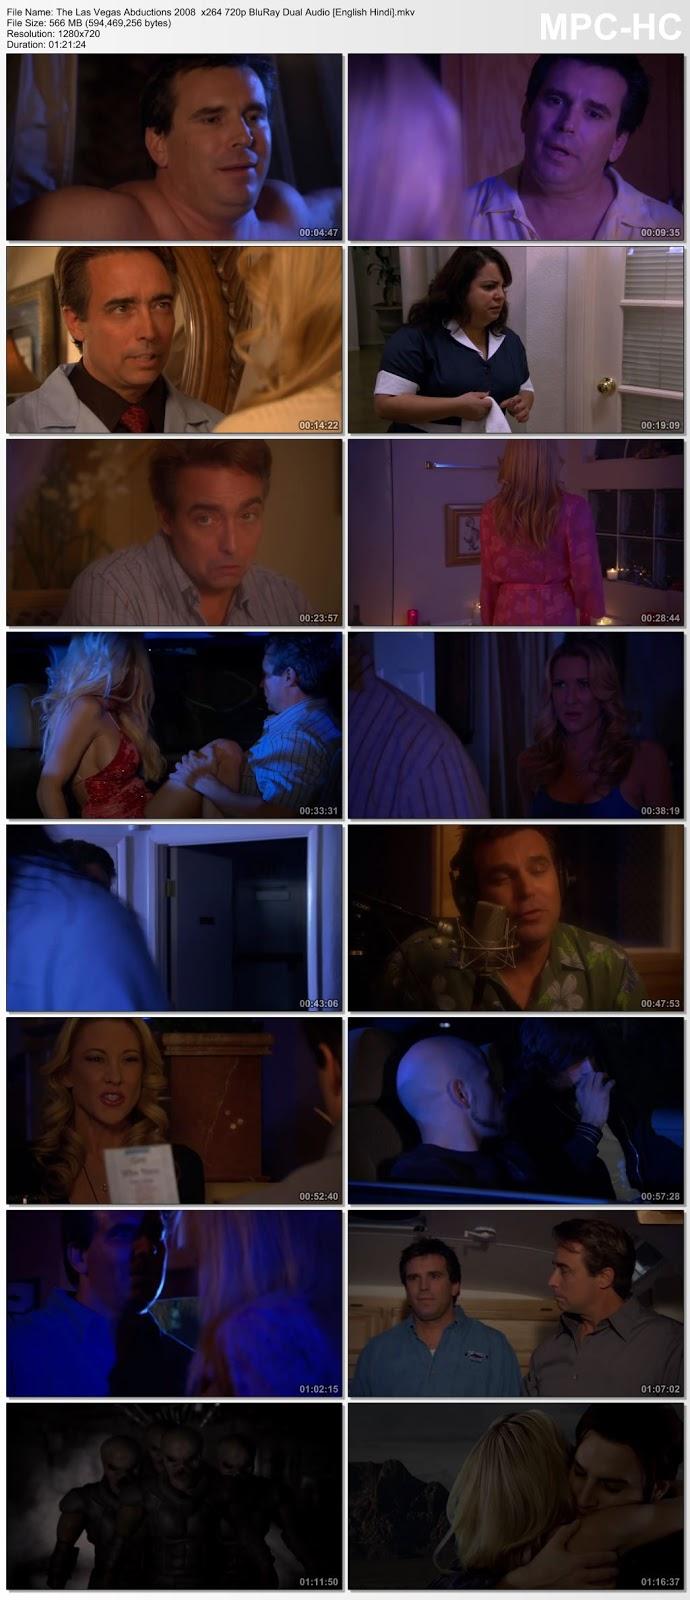 The Las Vegas Abductions (2008) 720p BluRay Dual Audio [Hindi – English] 550MB Desirehub